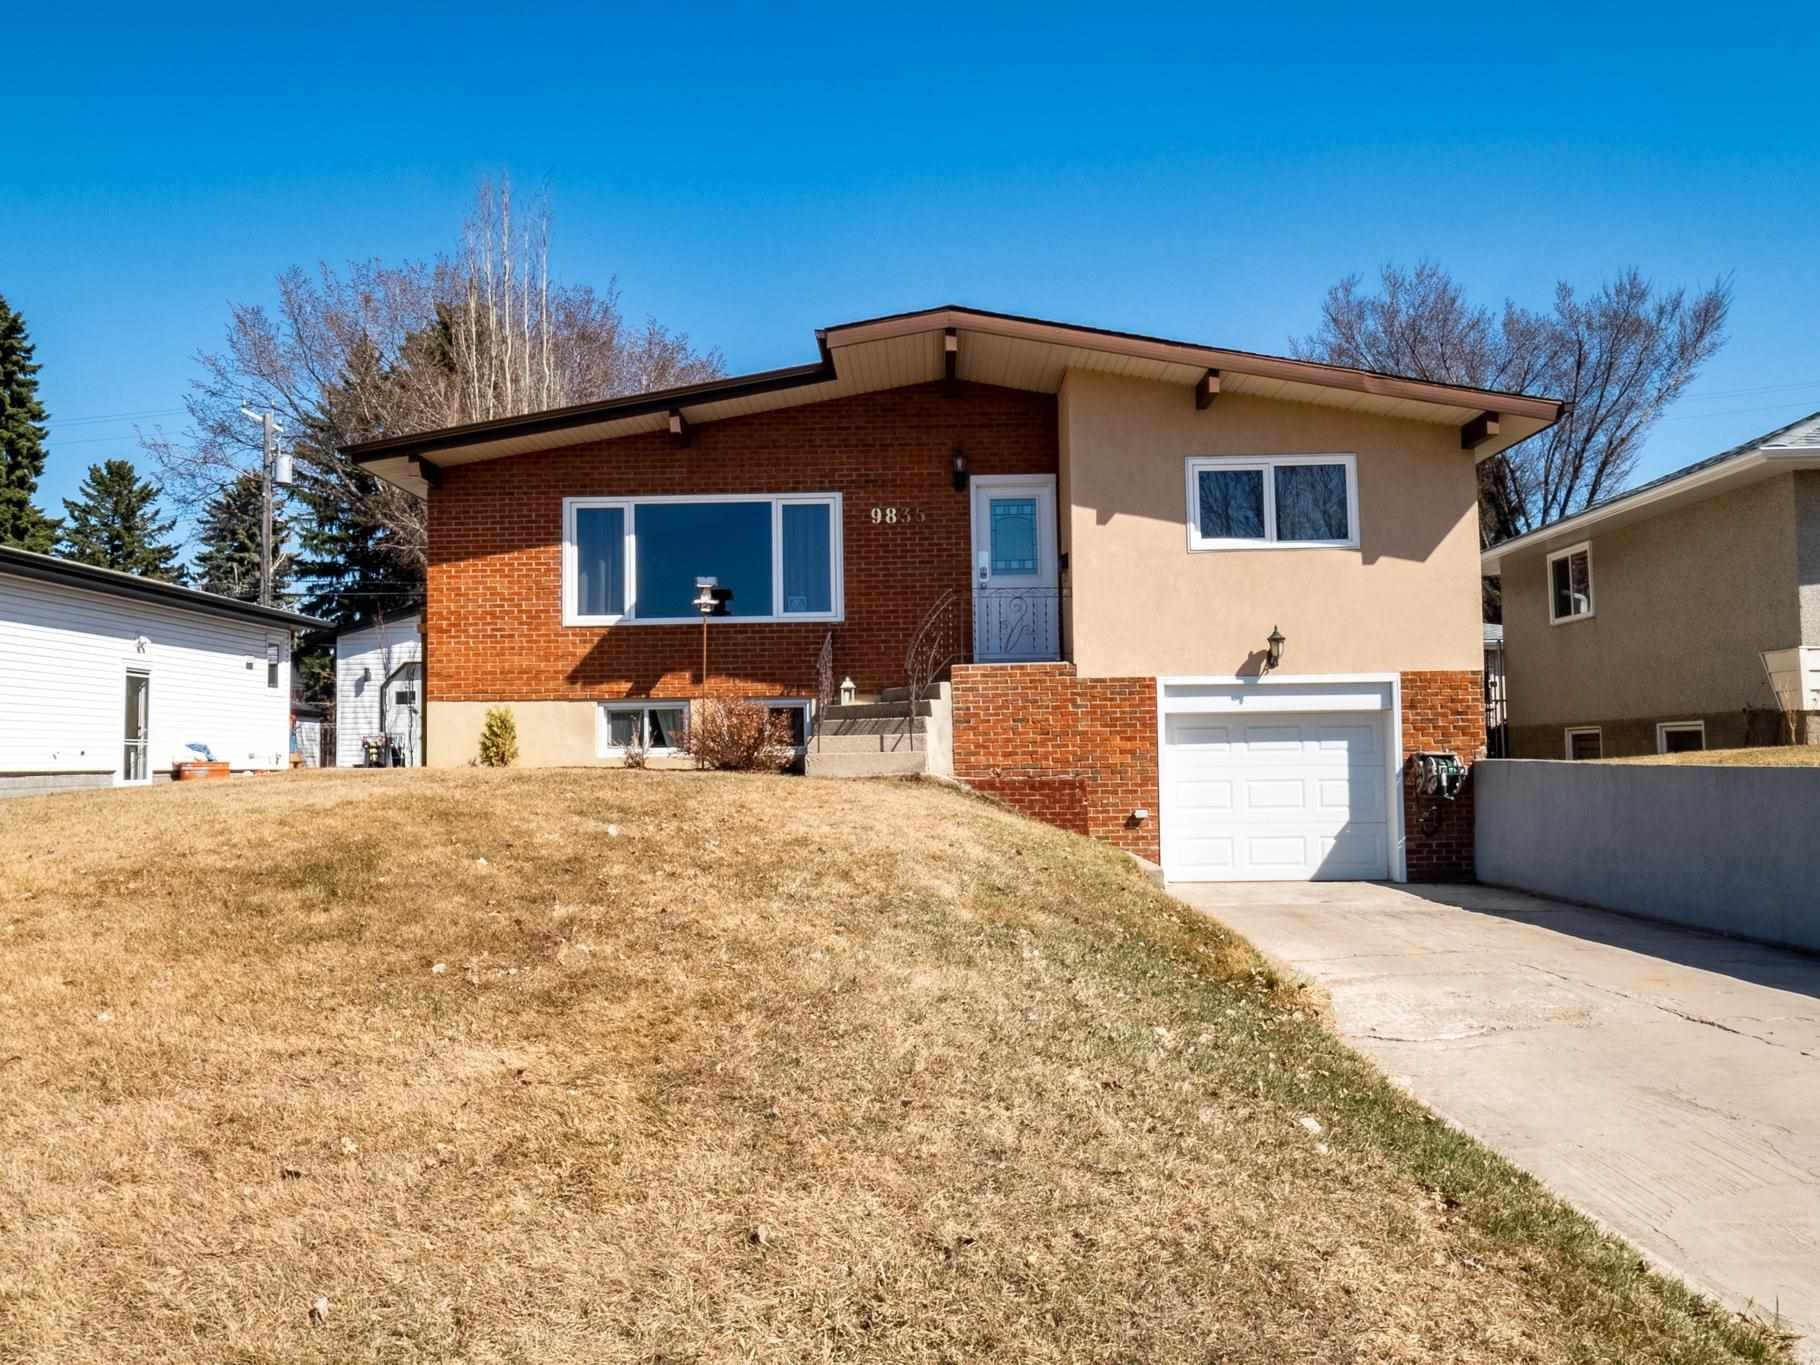 Main Photo: 9835 74 Street in Edmonton: Zone 19 House for sale : MLS®# E4248699